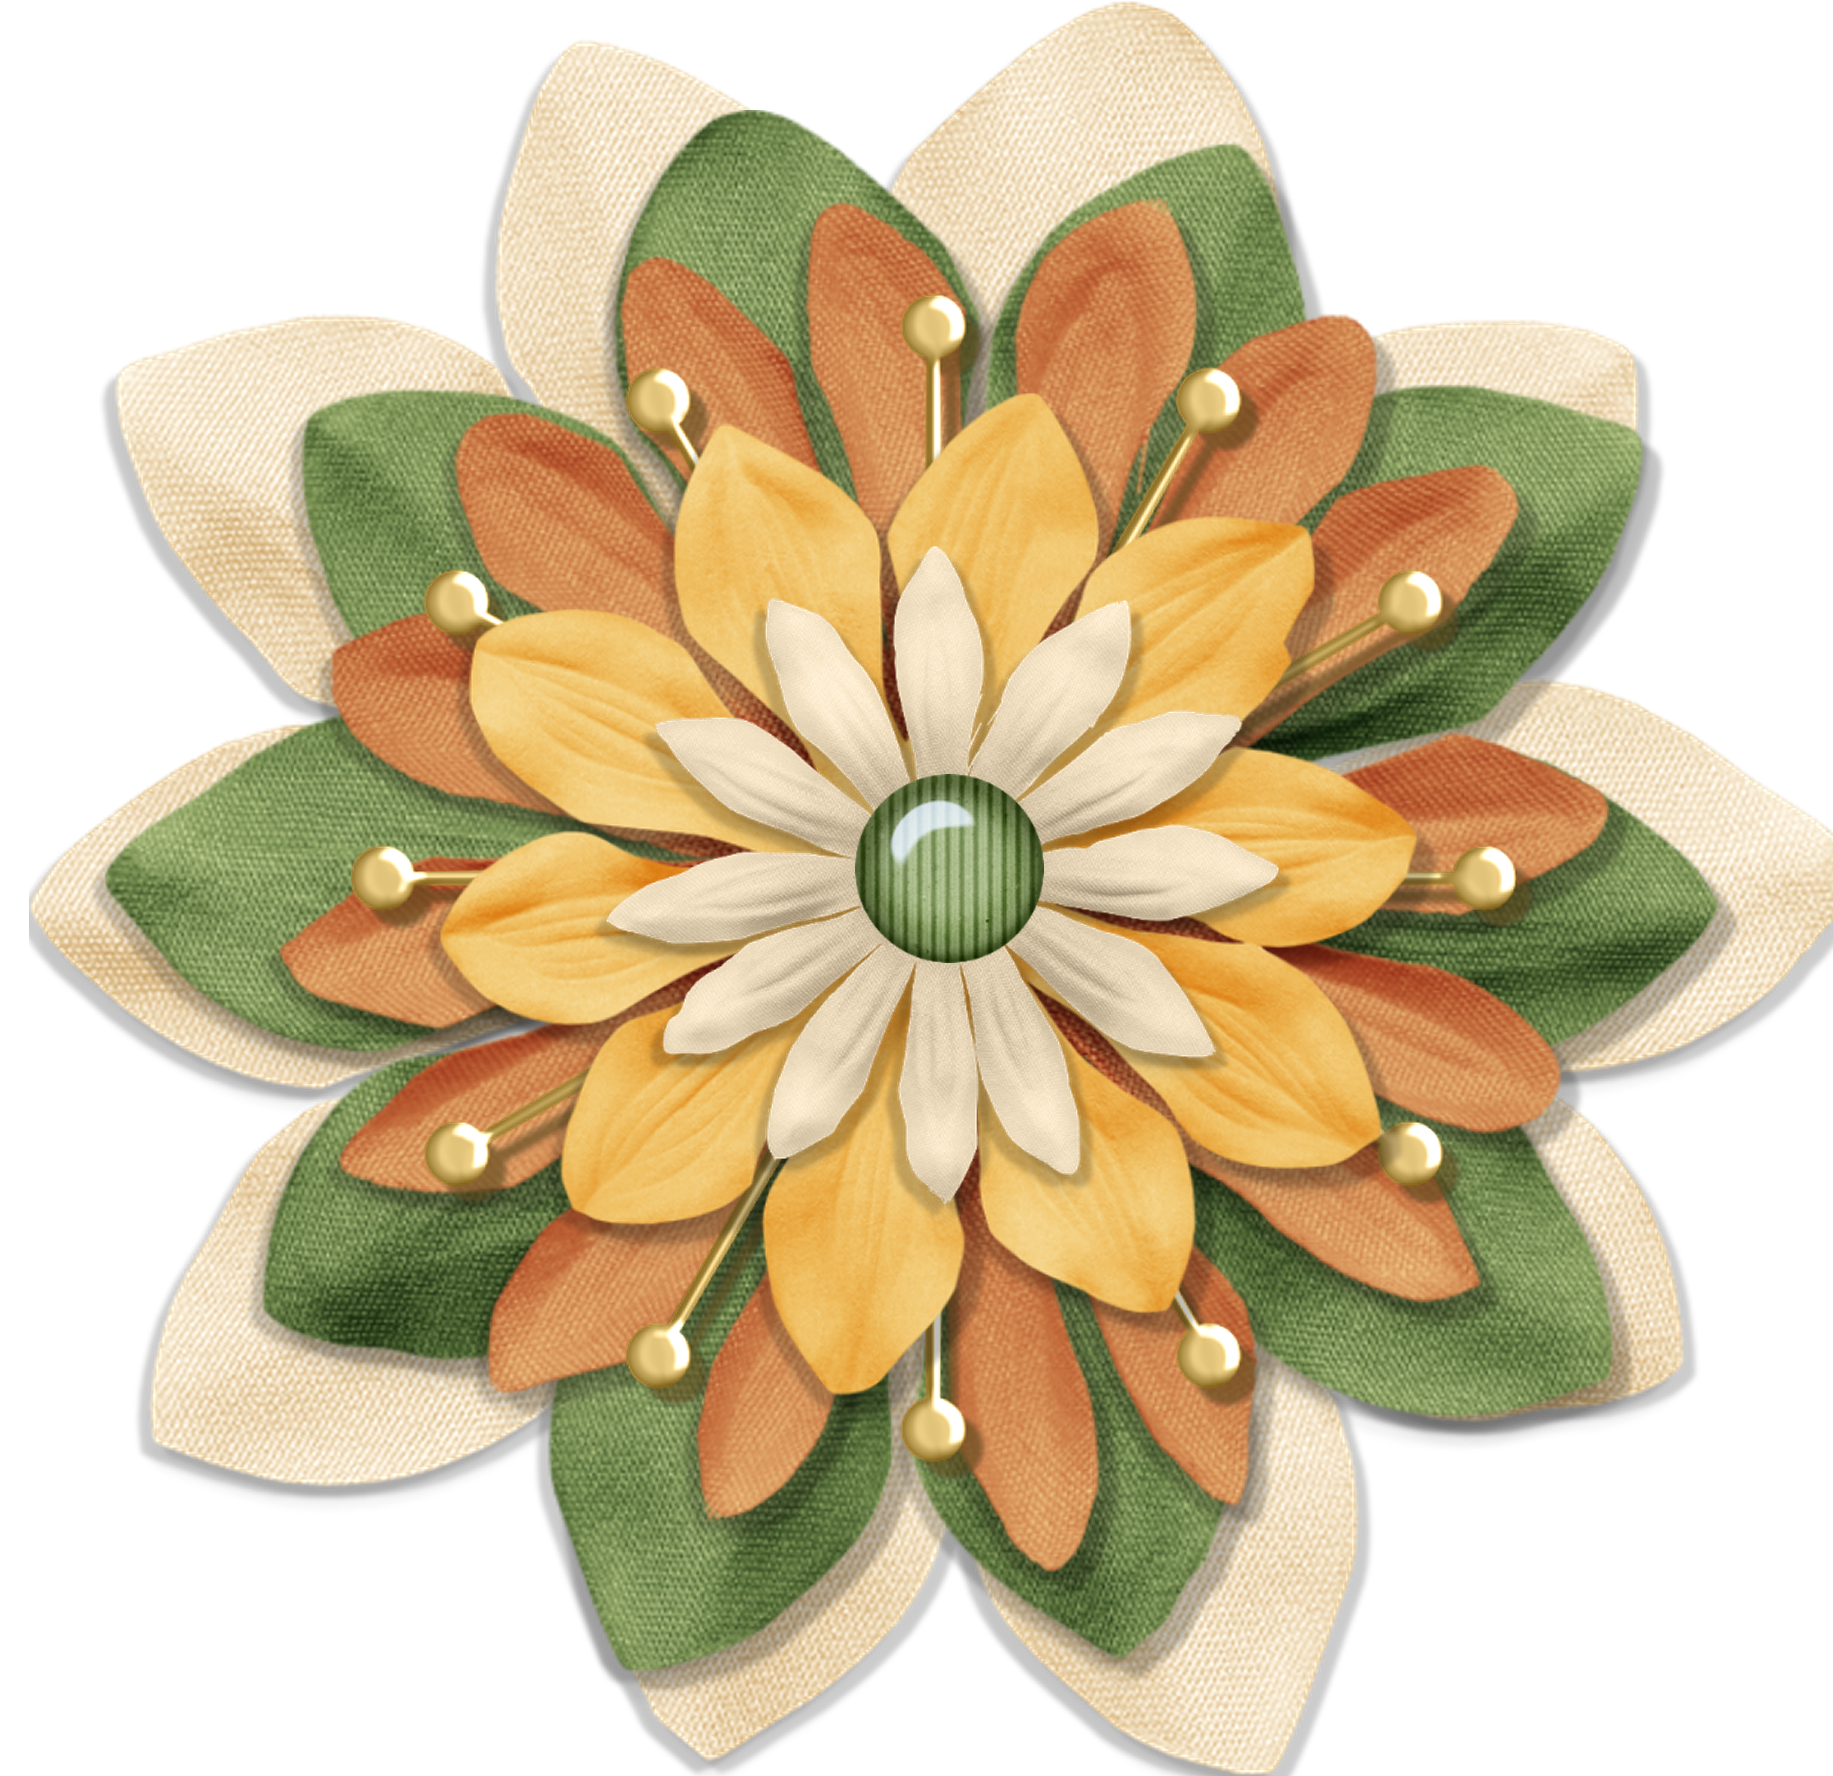 flores clip art. Flower clipart scrapbook